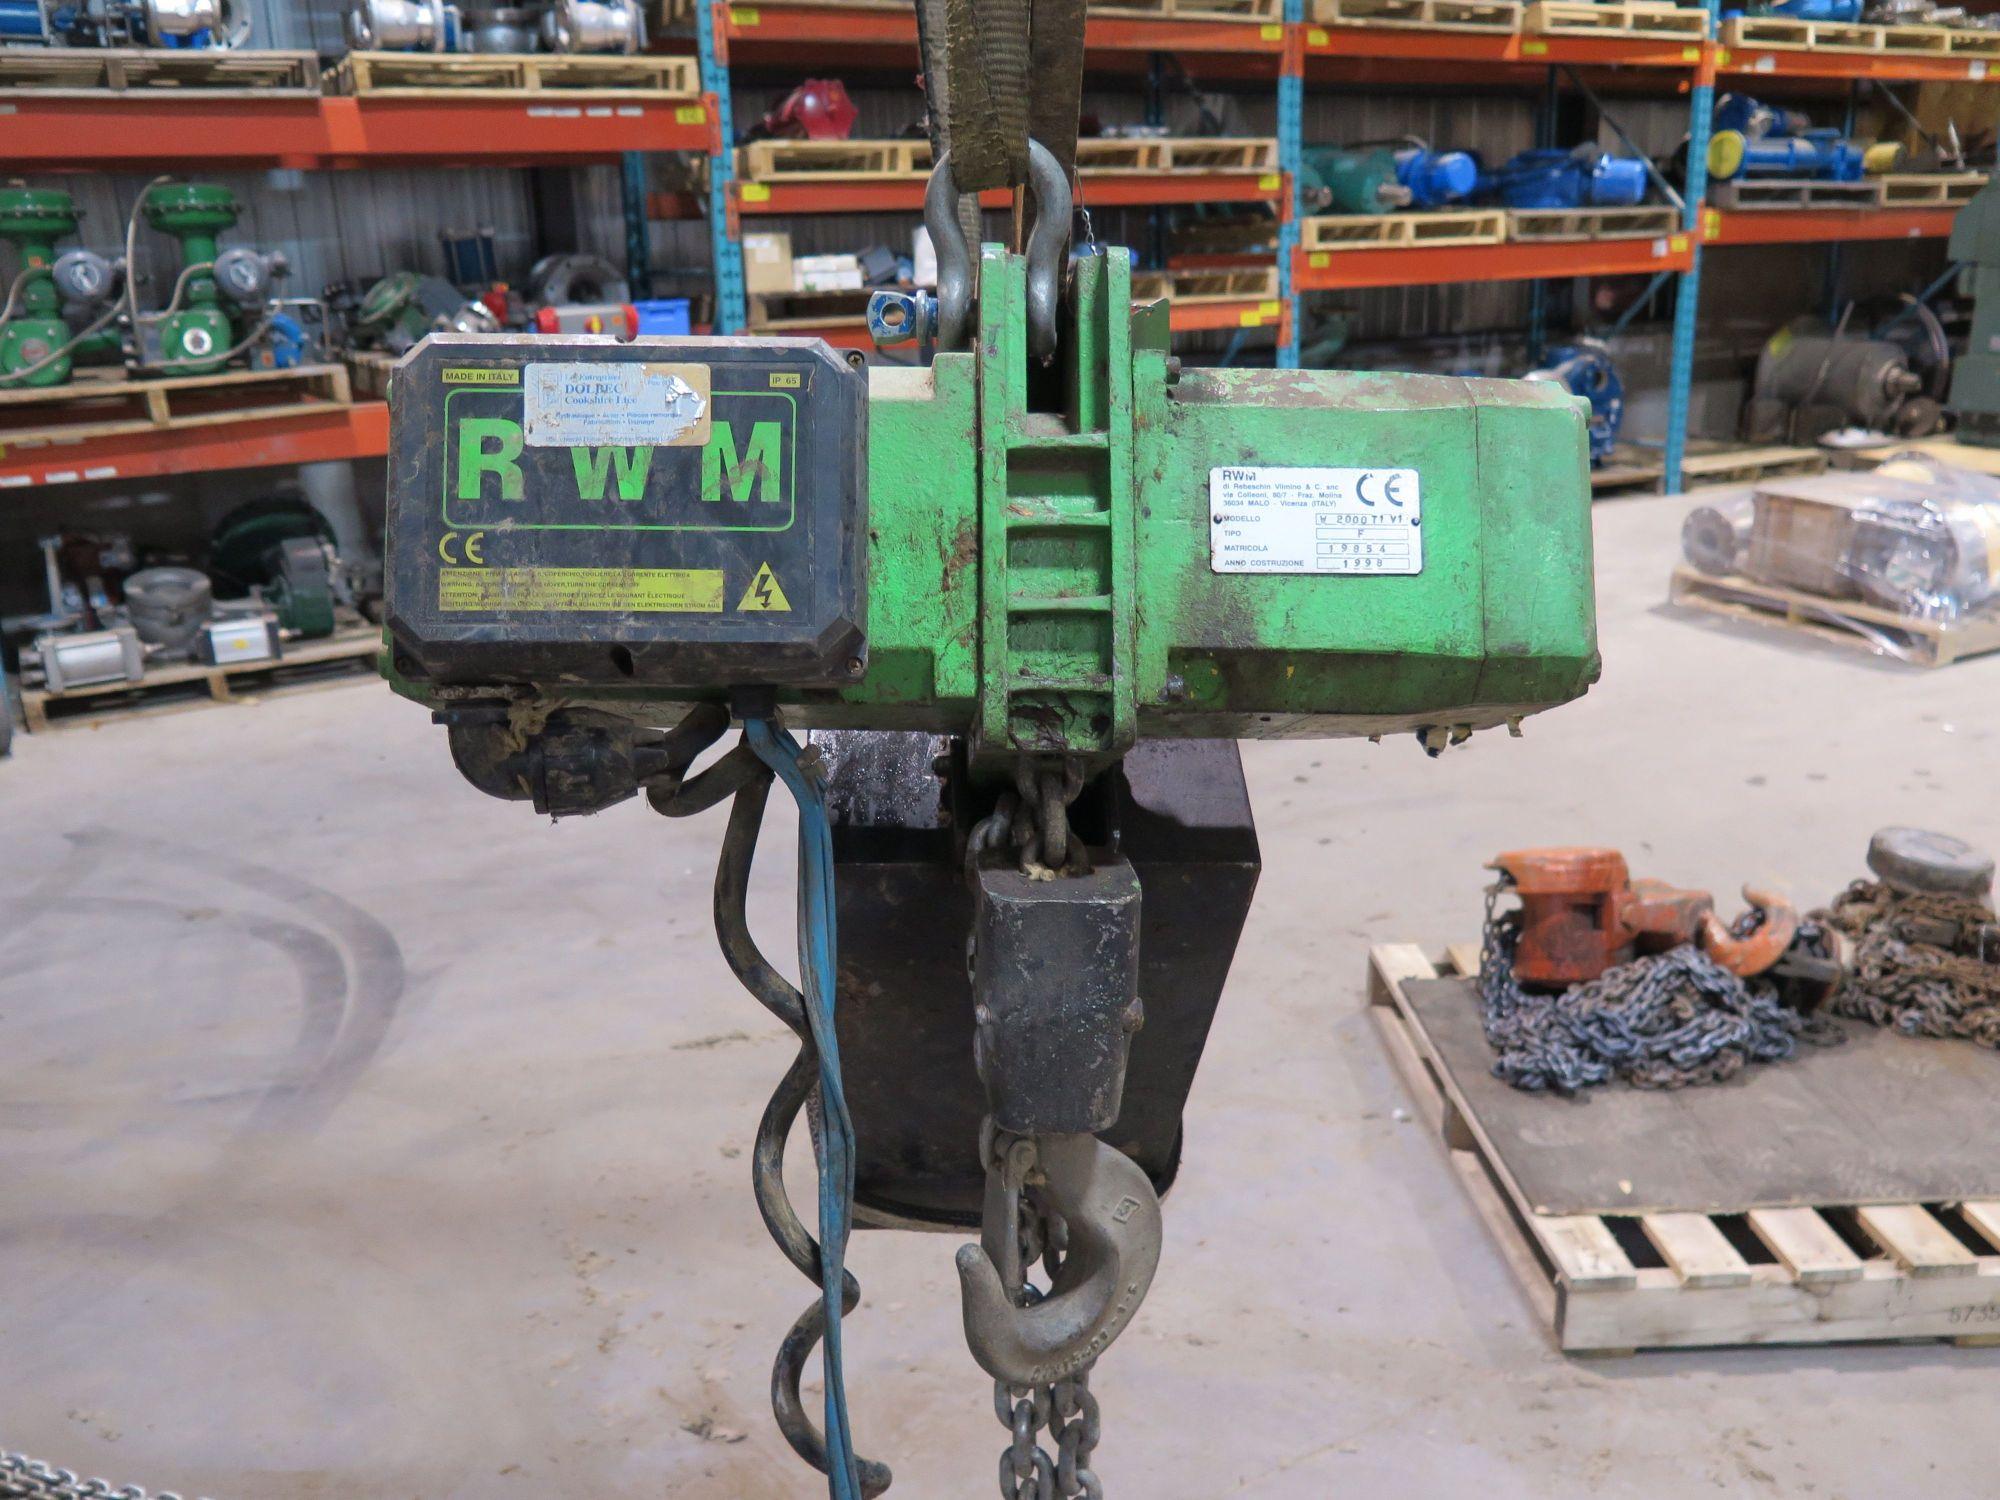 hight resolution of electric chain hoist 2 ton rwm w2000t1v1 yale wiring schematic rwm electric hoist wiring diagram